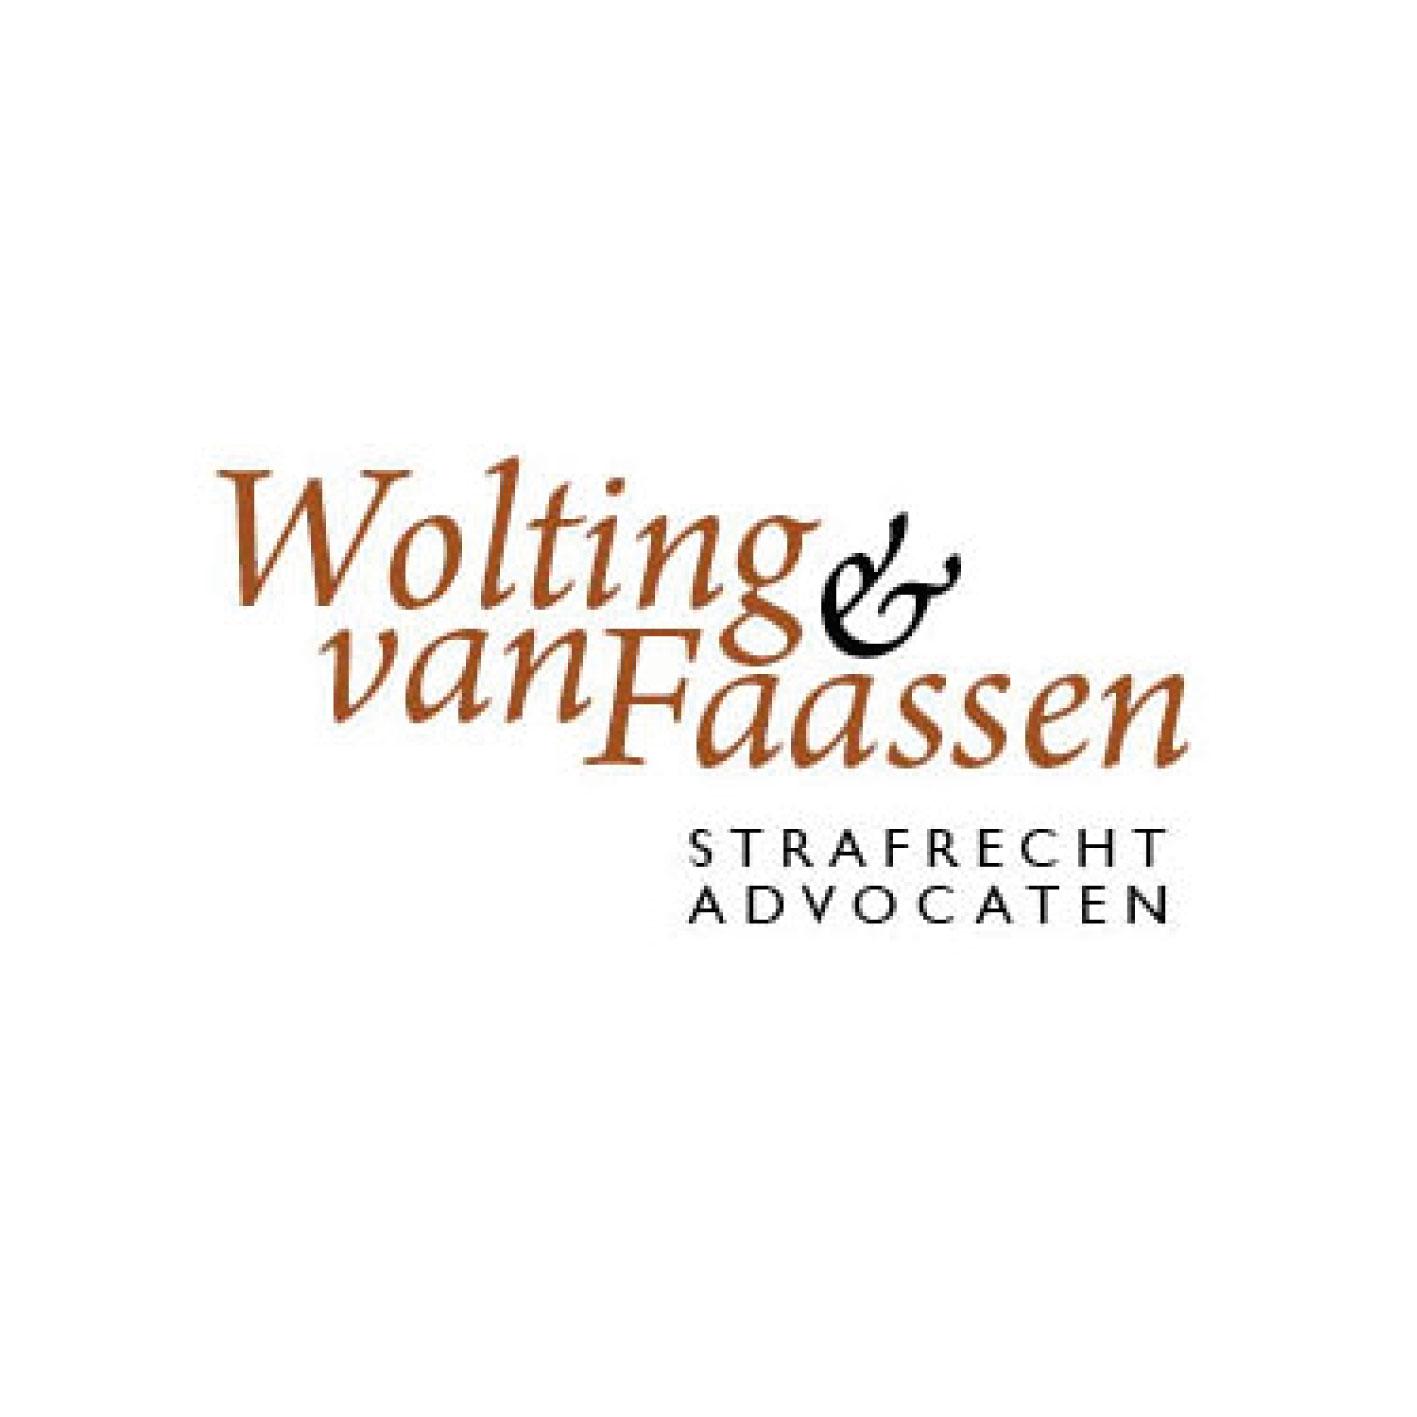 Wolting & van Faassen